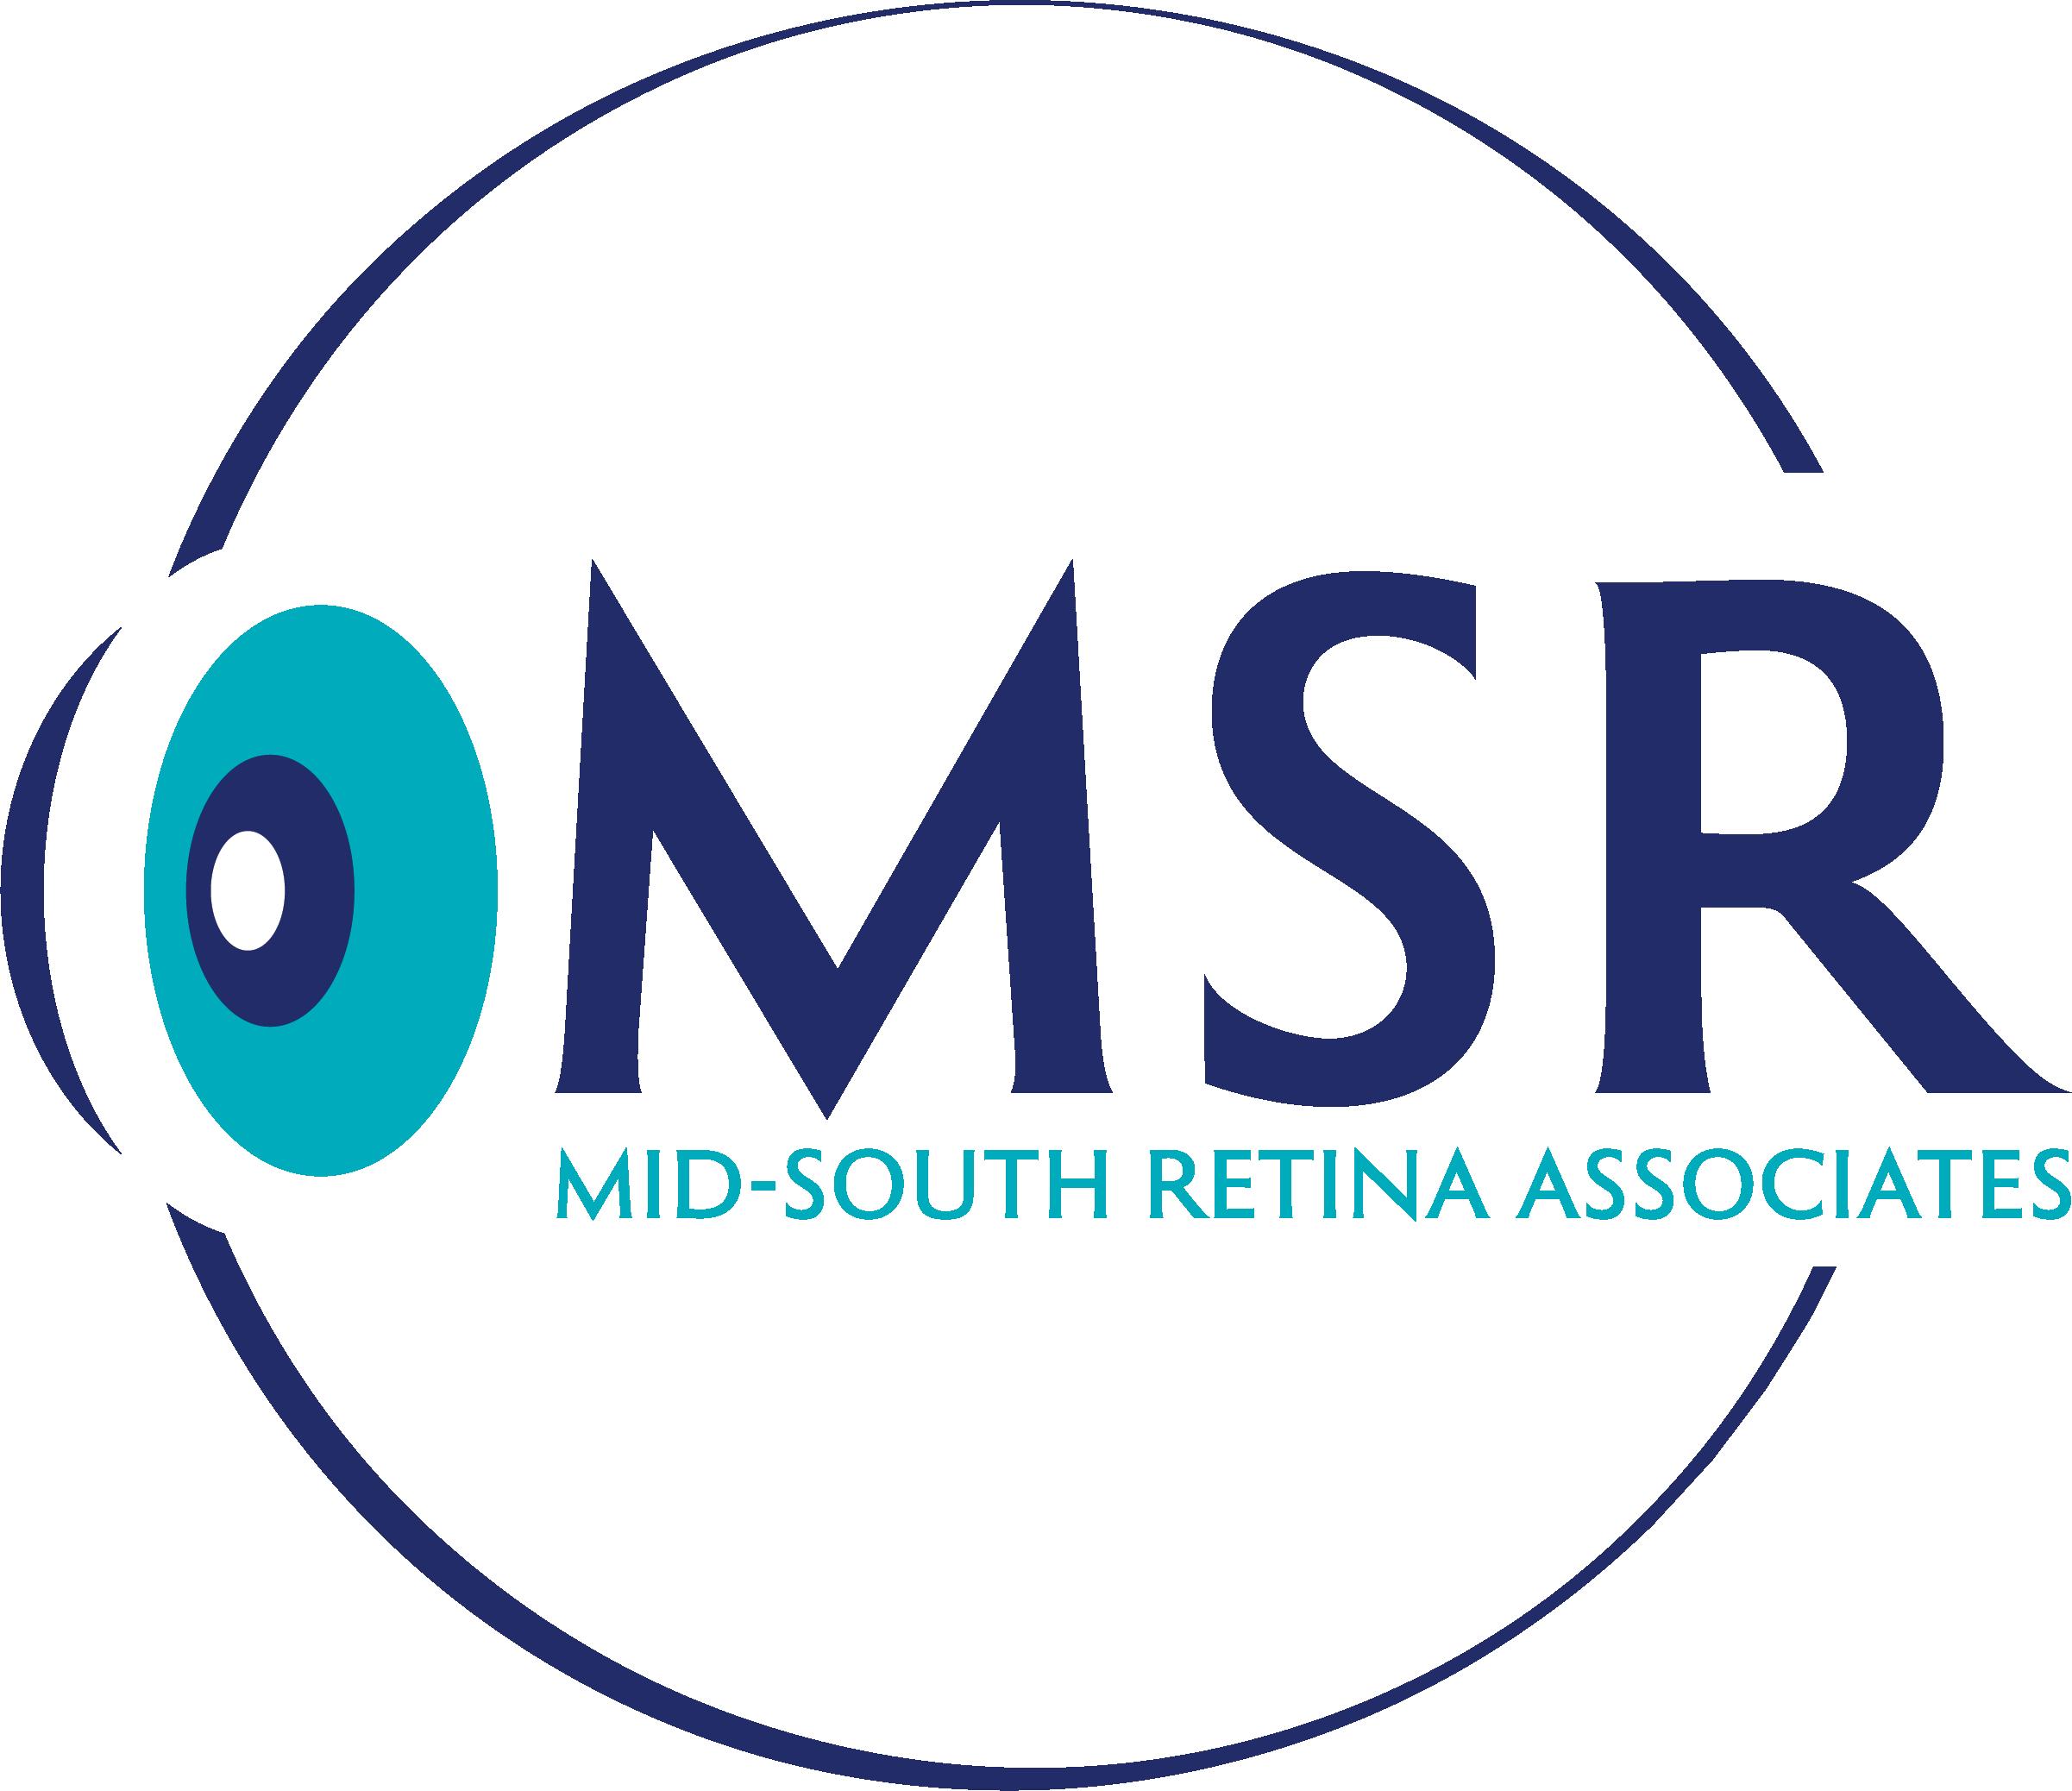 Mid-South Retina